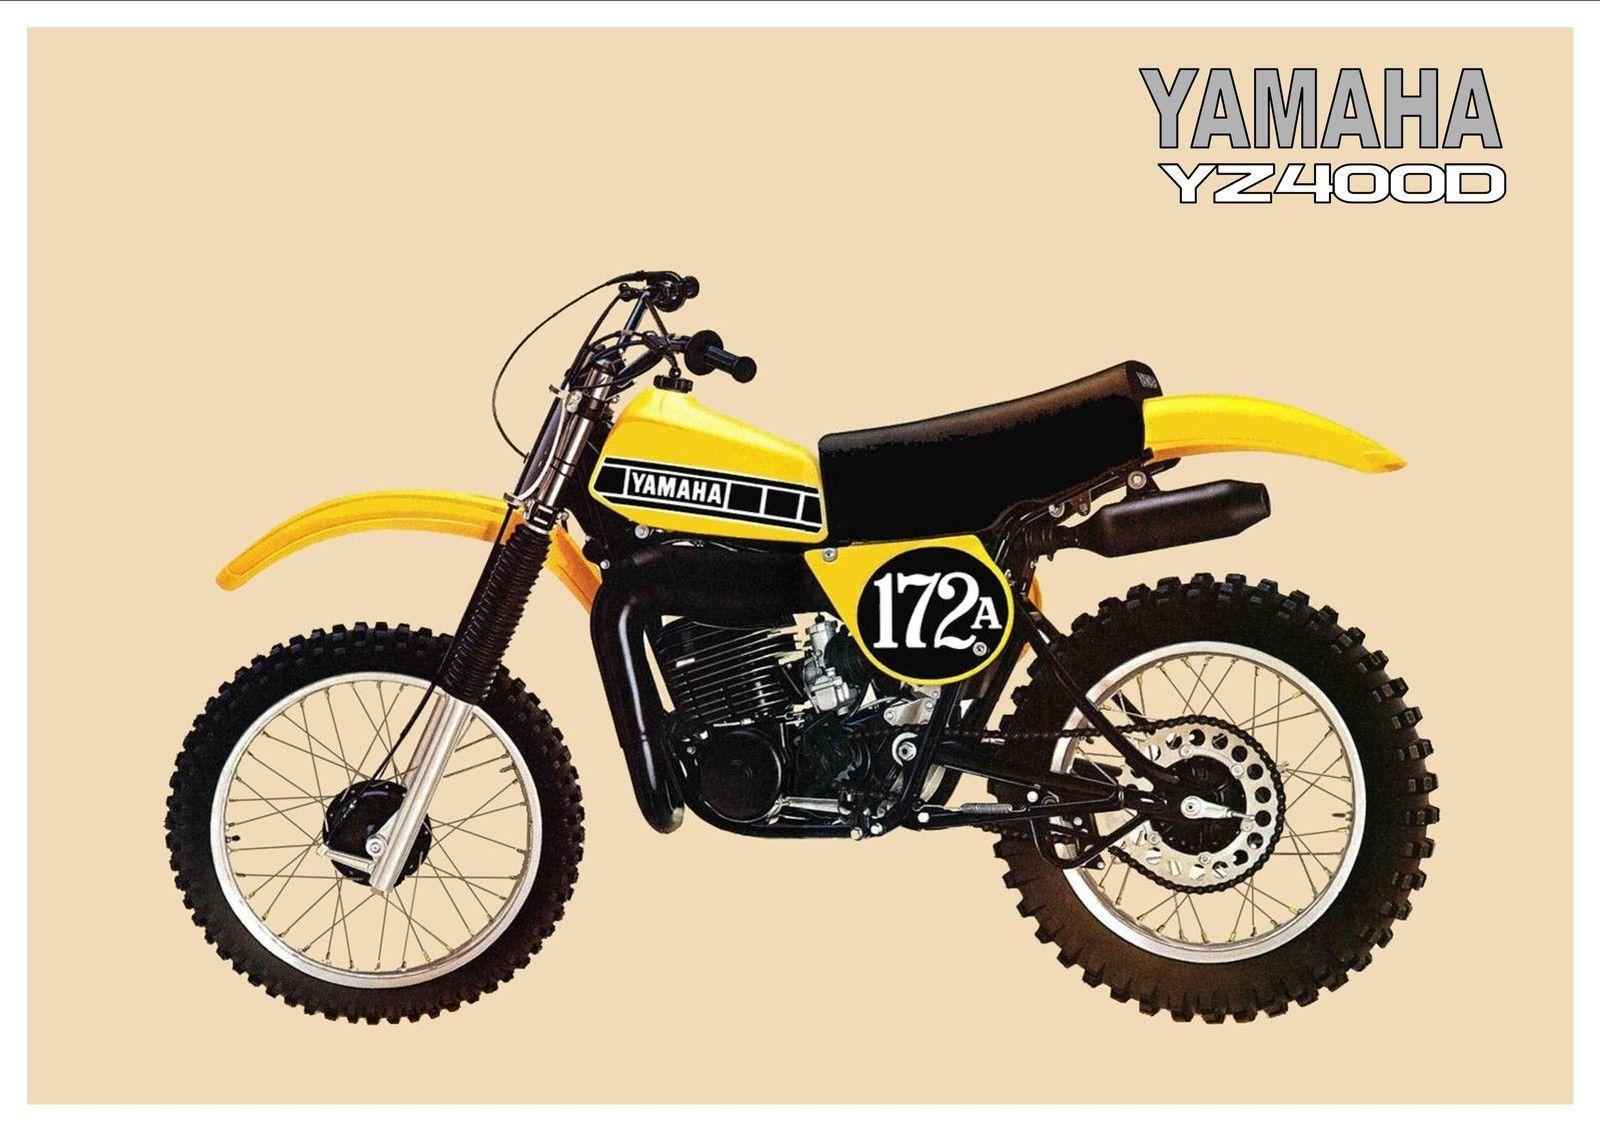 1977 Yz 400 D Manual Diagram Of 1973 Tx500 Yamaha Motorcycle Disc Brake Caliper Array 49 Best Images On Pinterest In 2018 Rh Com